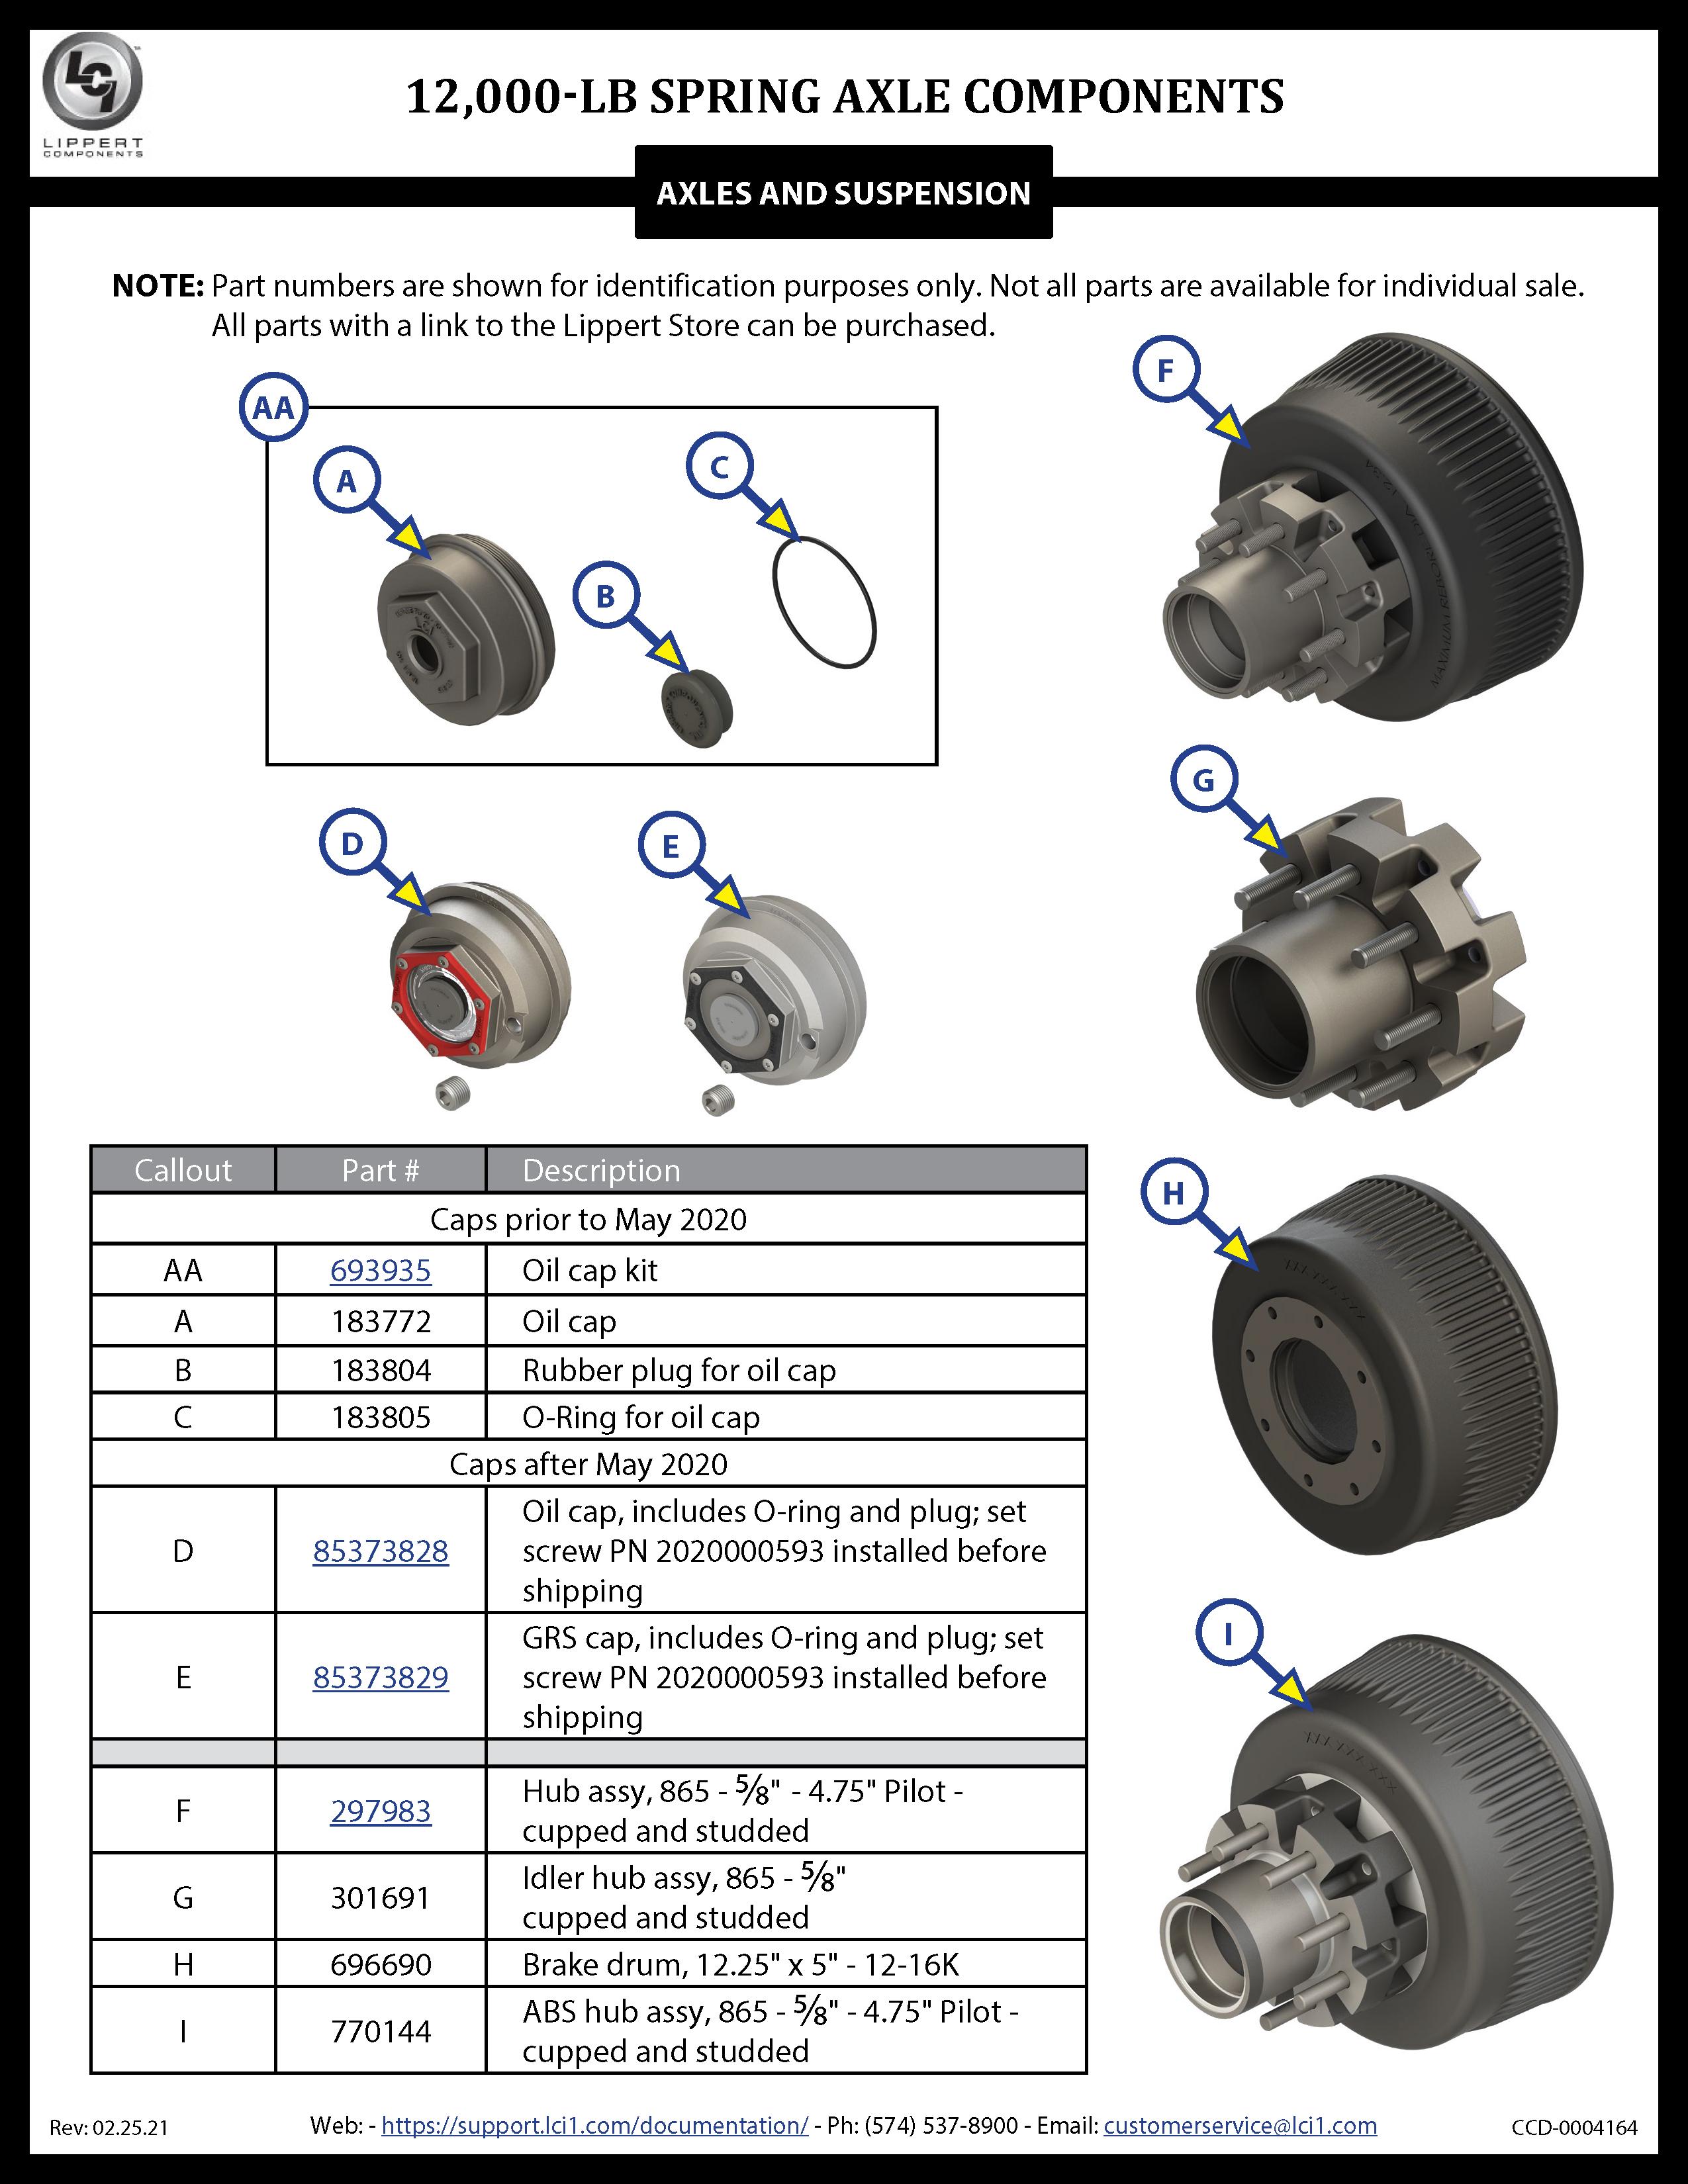 12,000-LB Spring Axle Components